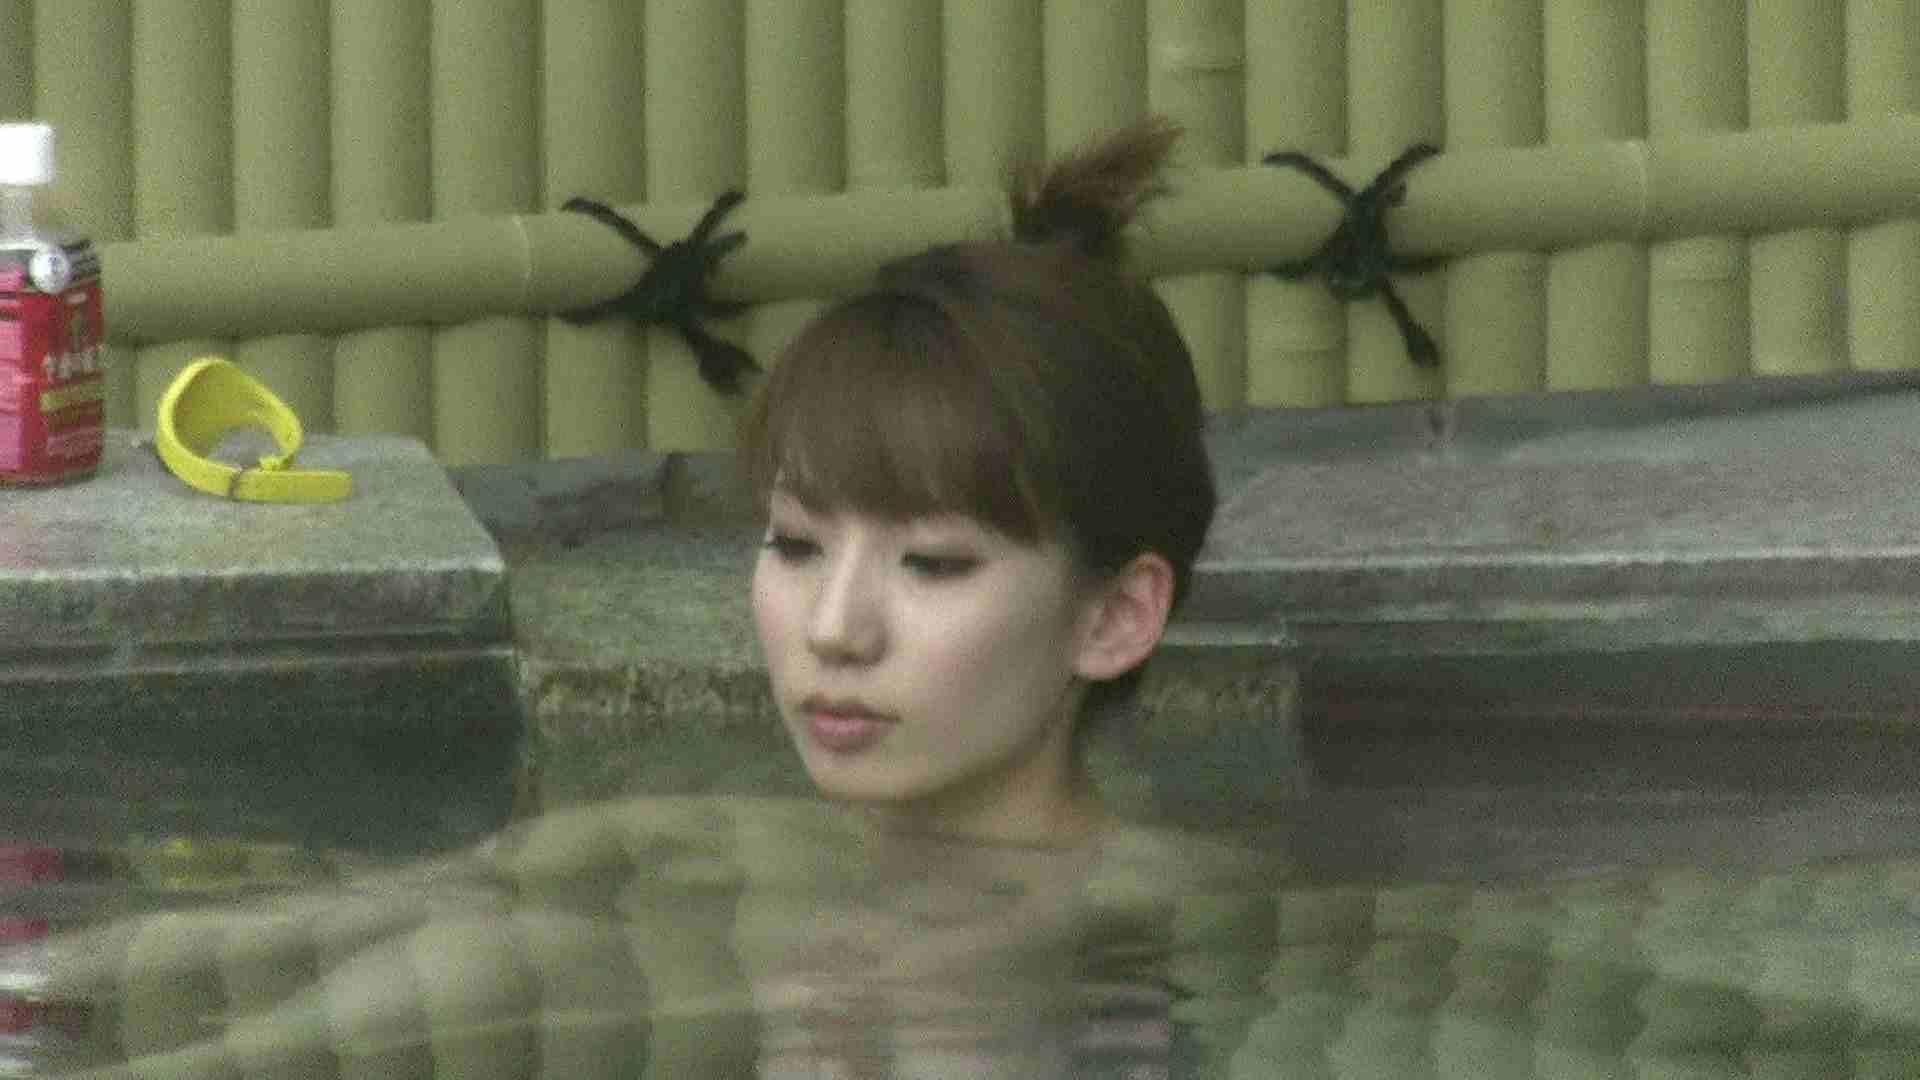 Aquaな露天風呂Vol.208 HなOL   盗撮  101pic 43